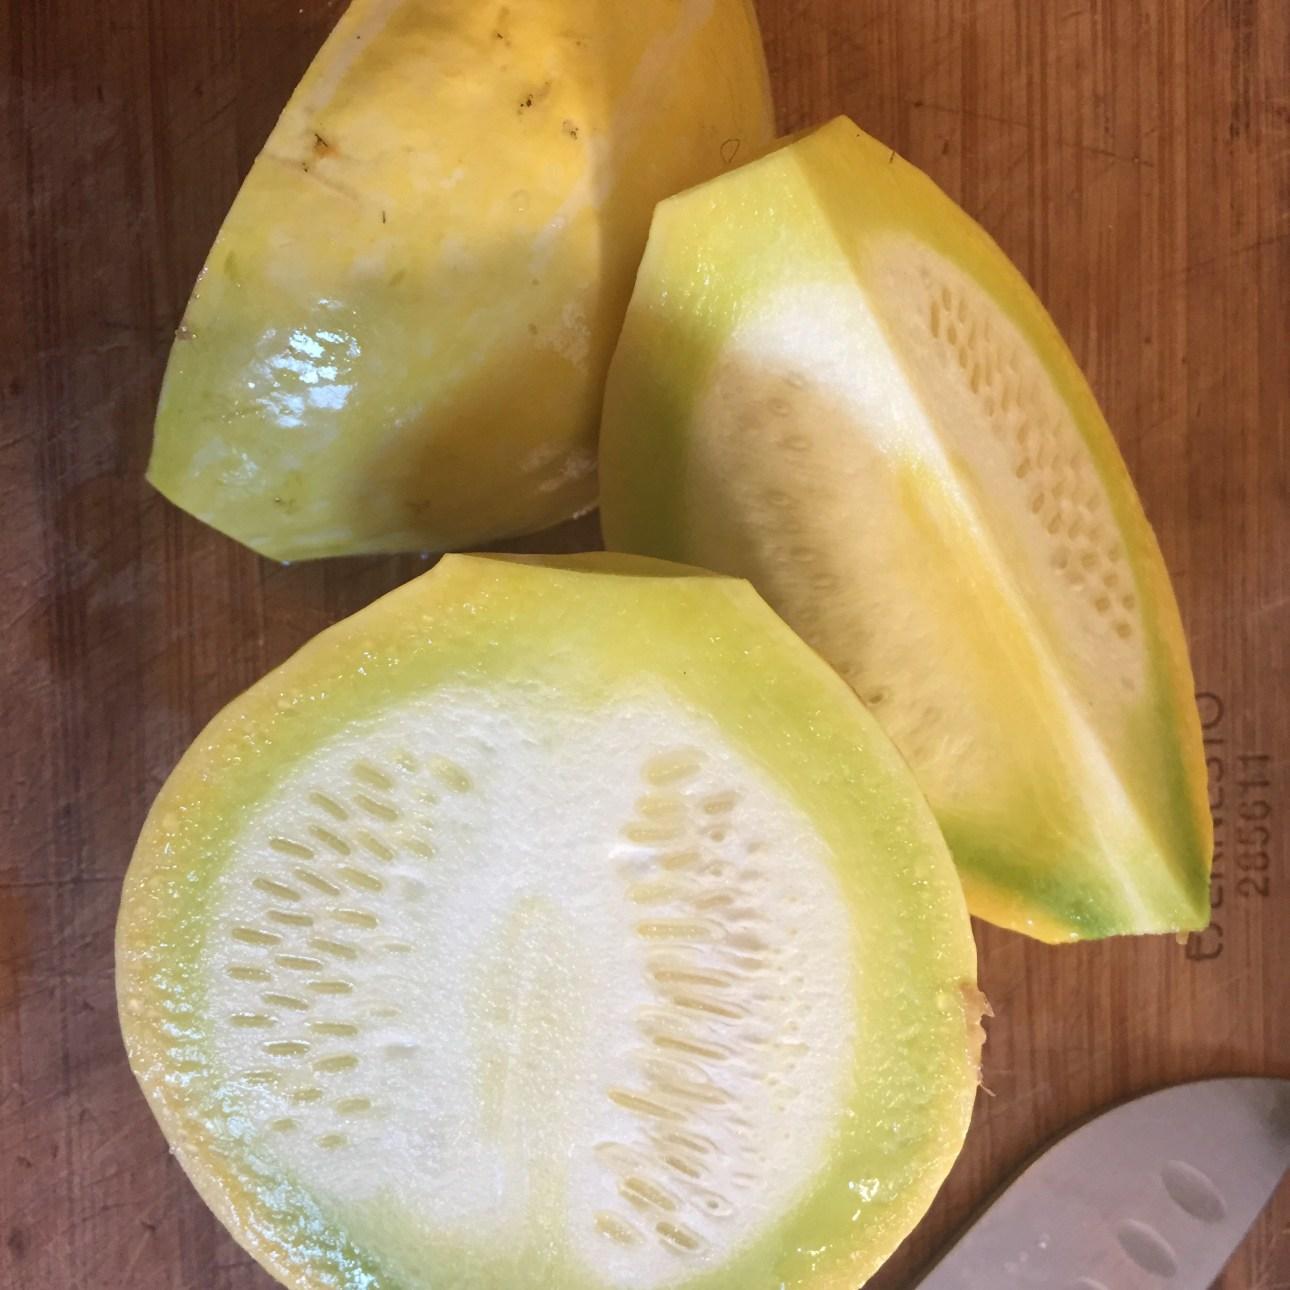 A yellow globe zucchini cut into three pieces